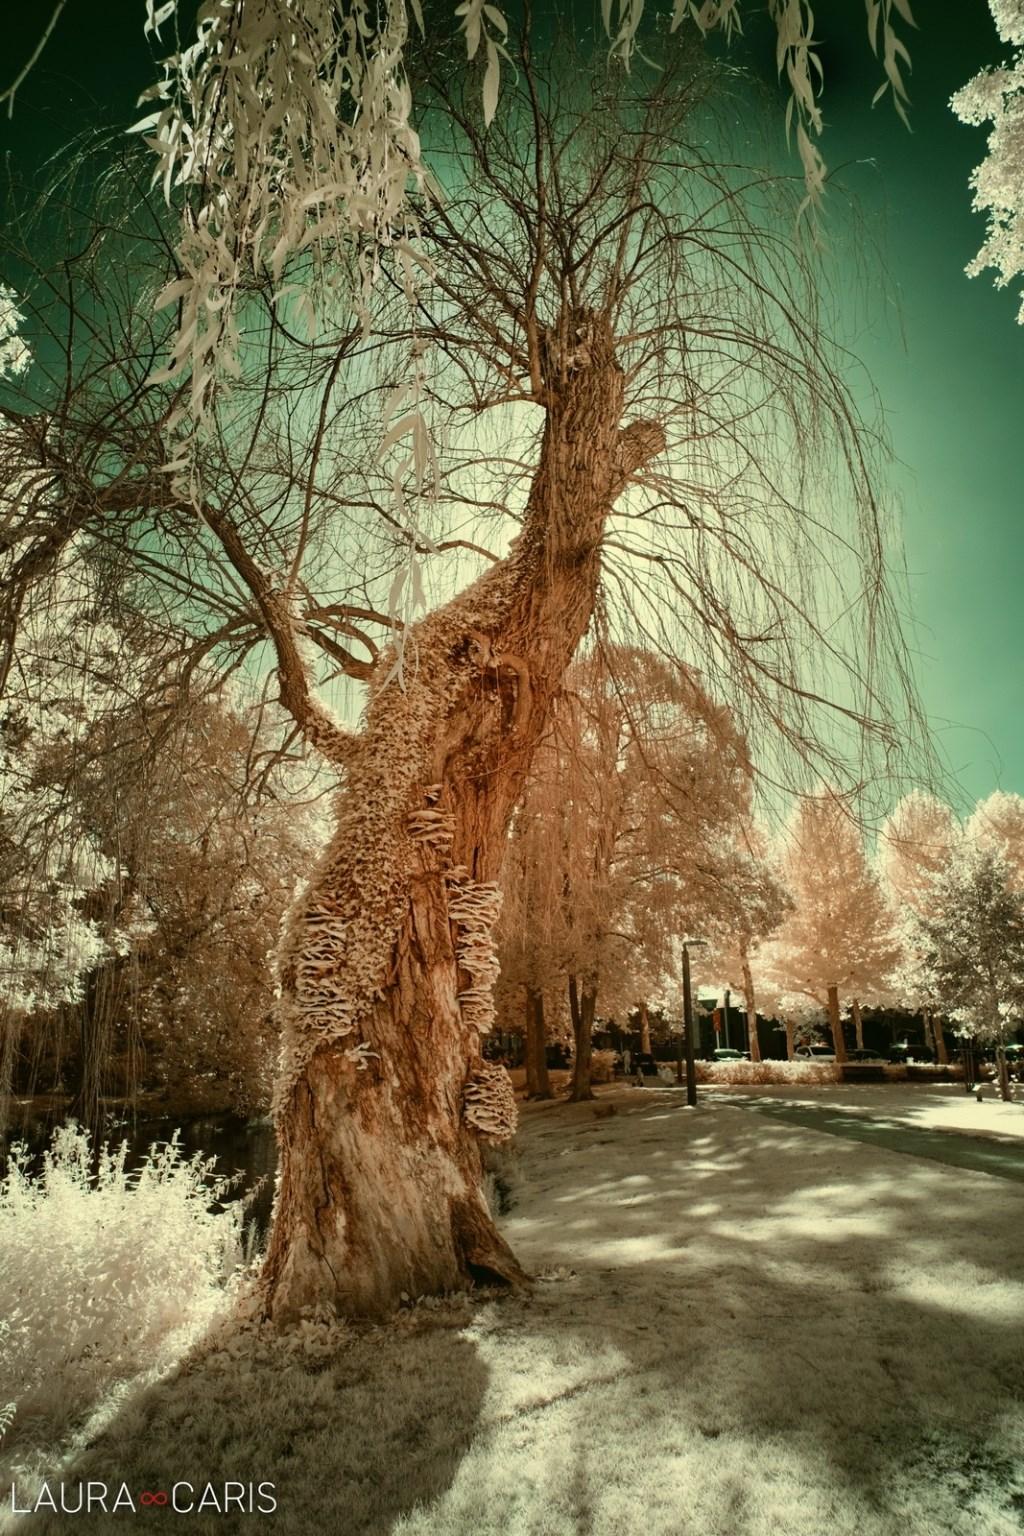 Laura Caris - The Magic Tree  © grenskoerier